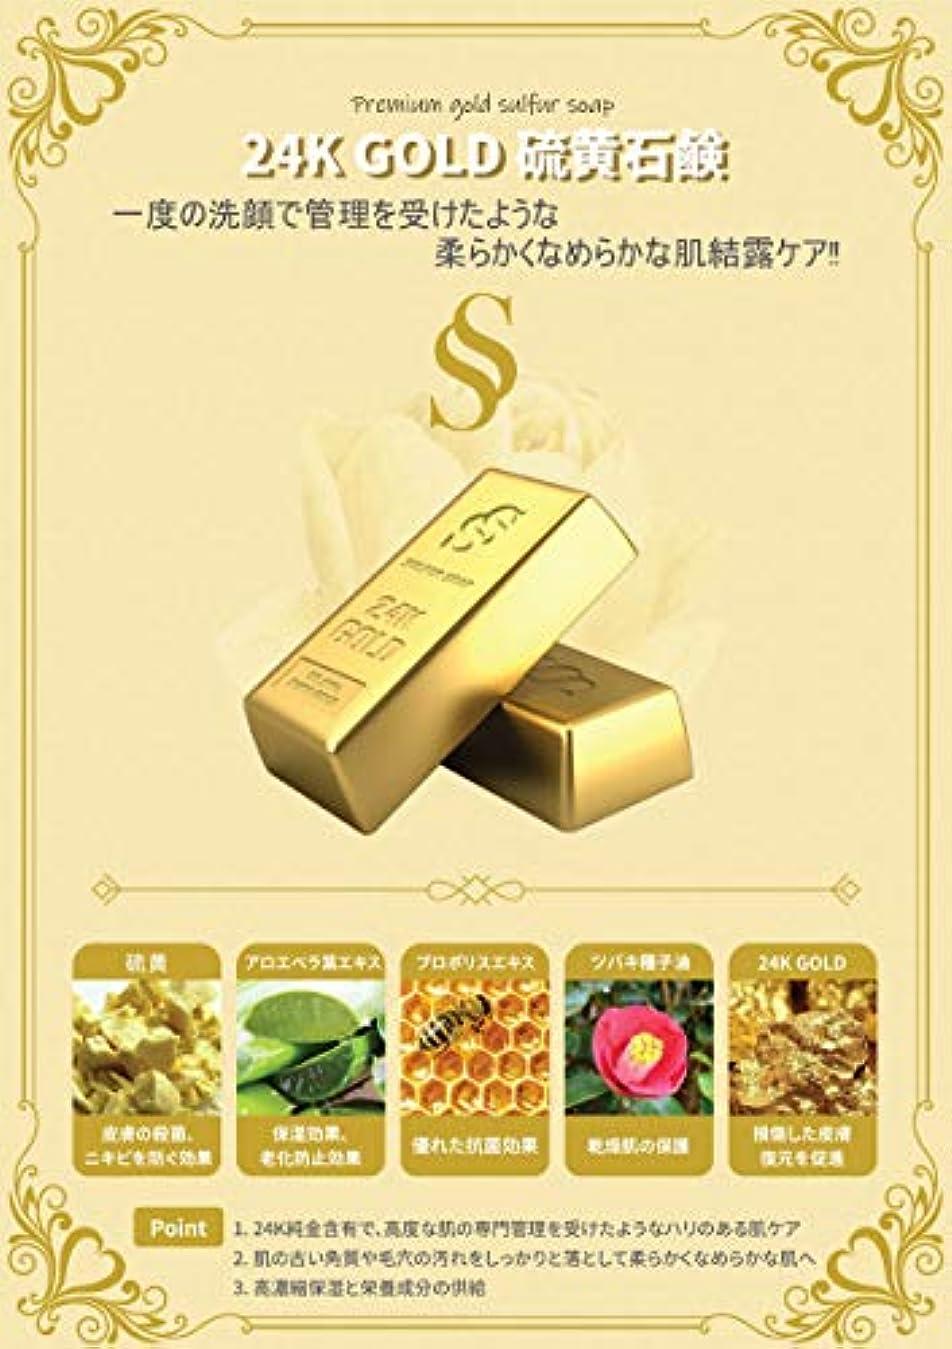 繁栄魔術師佐賀24Kゴールドバー 石鹸 植物性硫黄/24K SAKURA